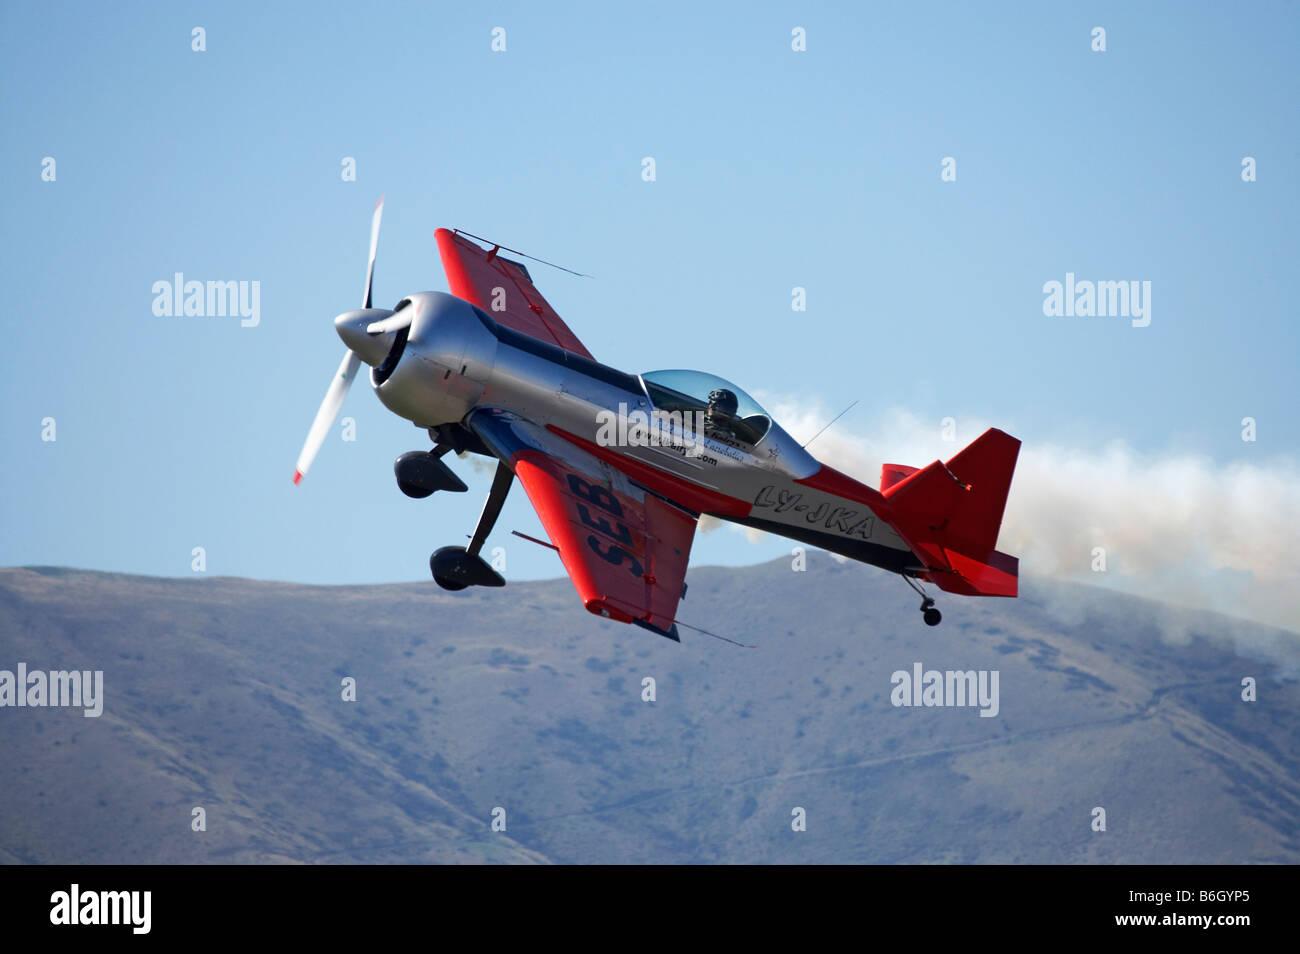 Stunt Plane flown by Lithuanian Jurgis Kairys - Stock Image